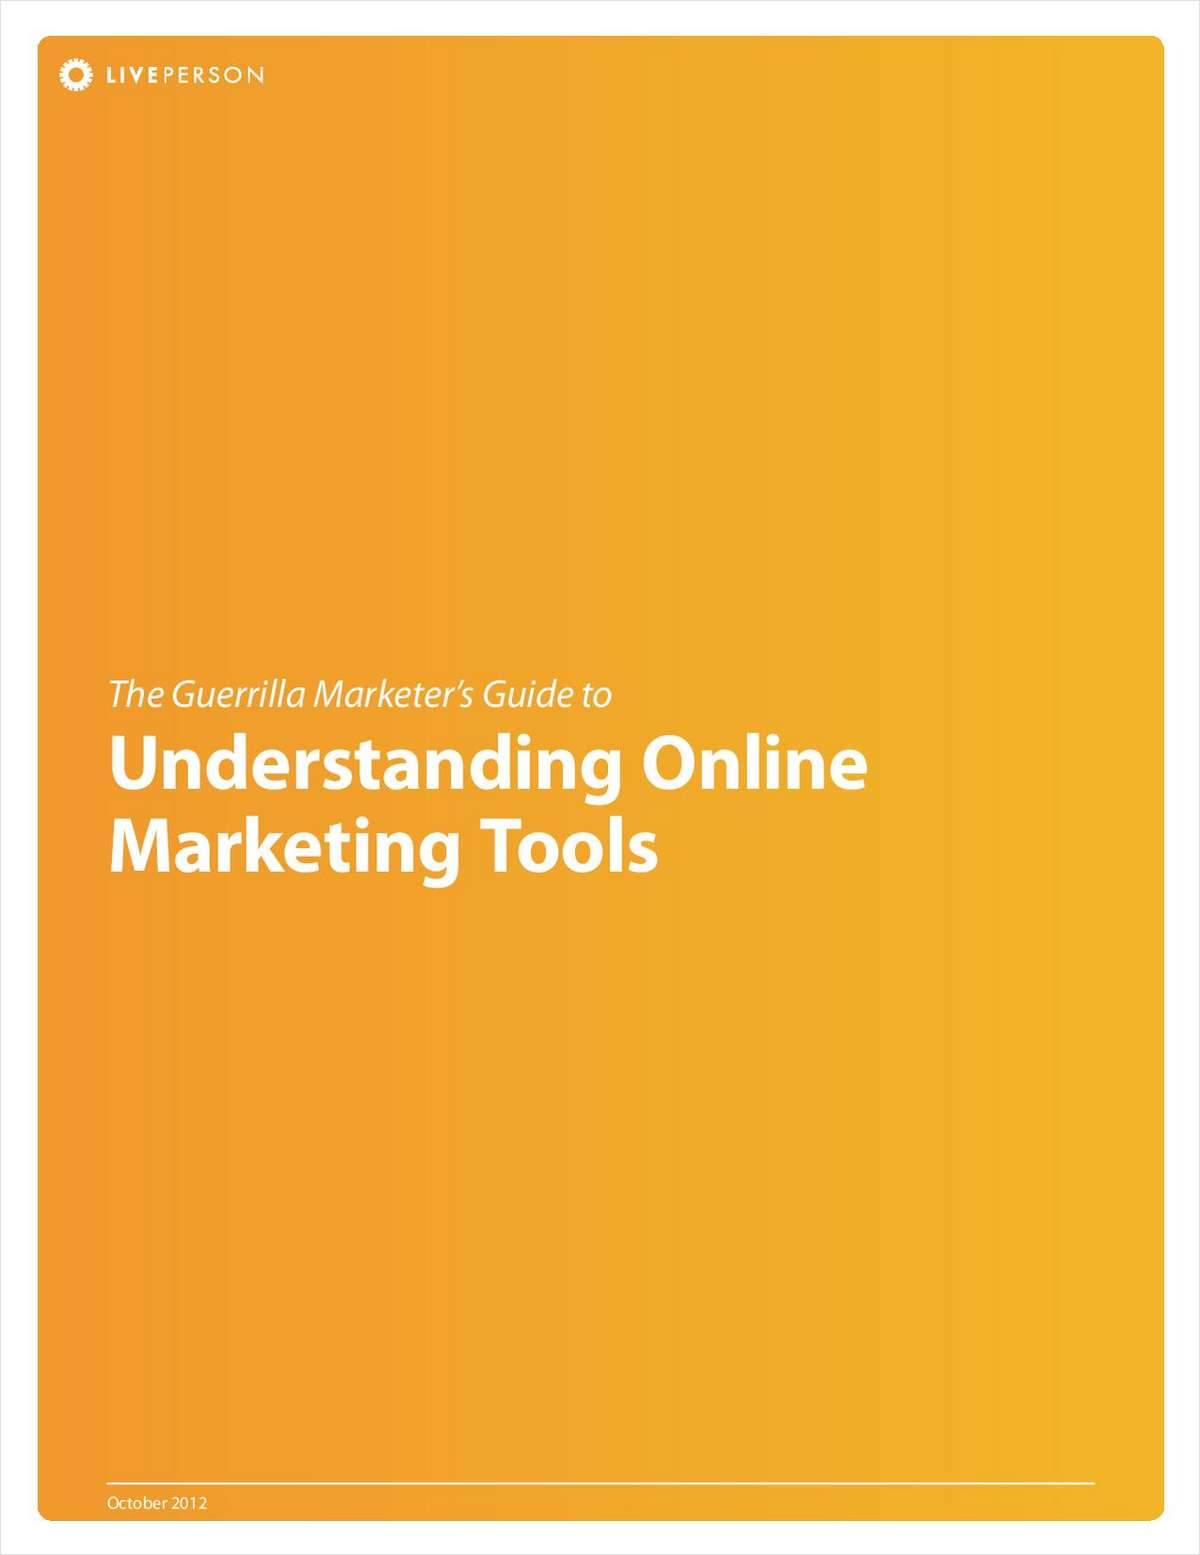 The Guerrilla Marketer's Guide to Understanding Online Marketing Tools